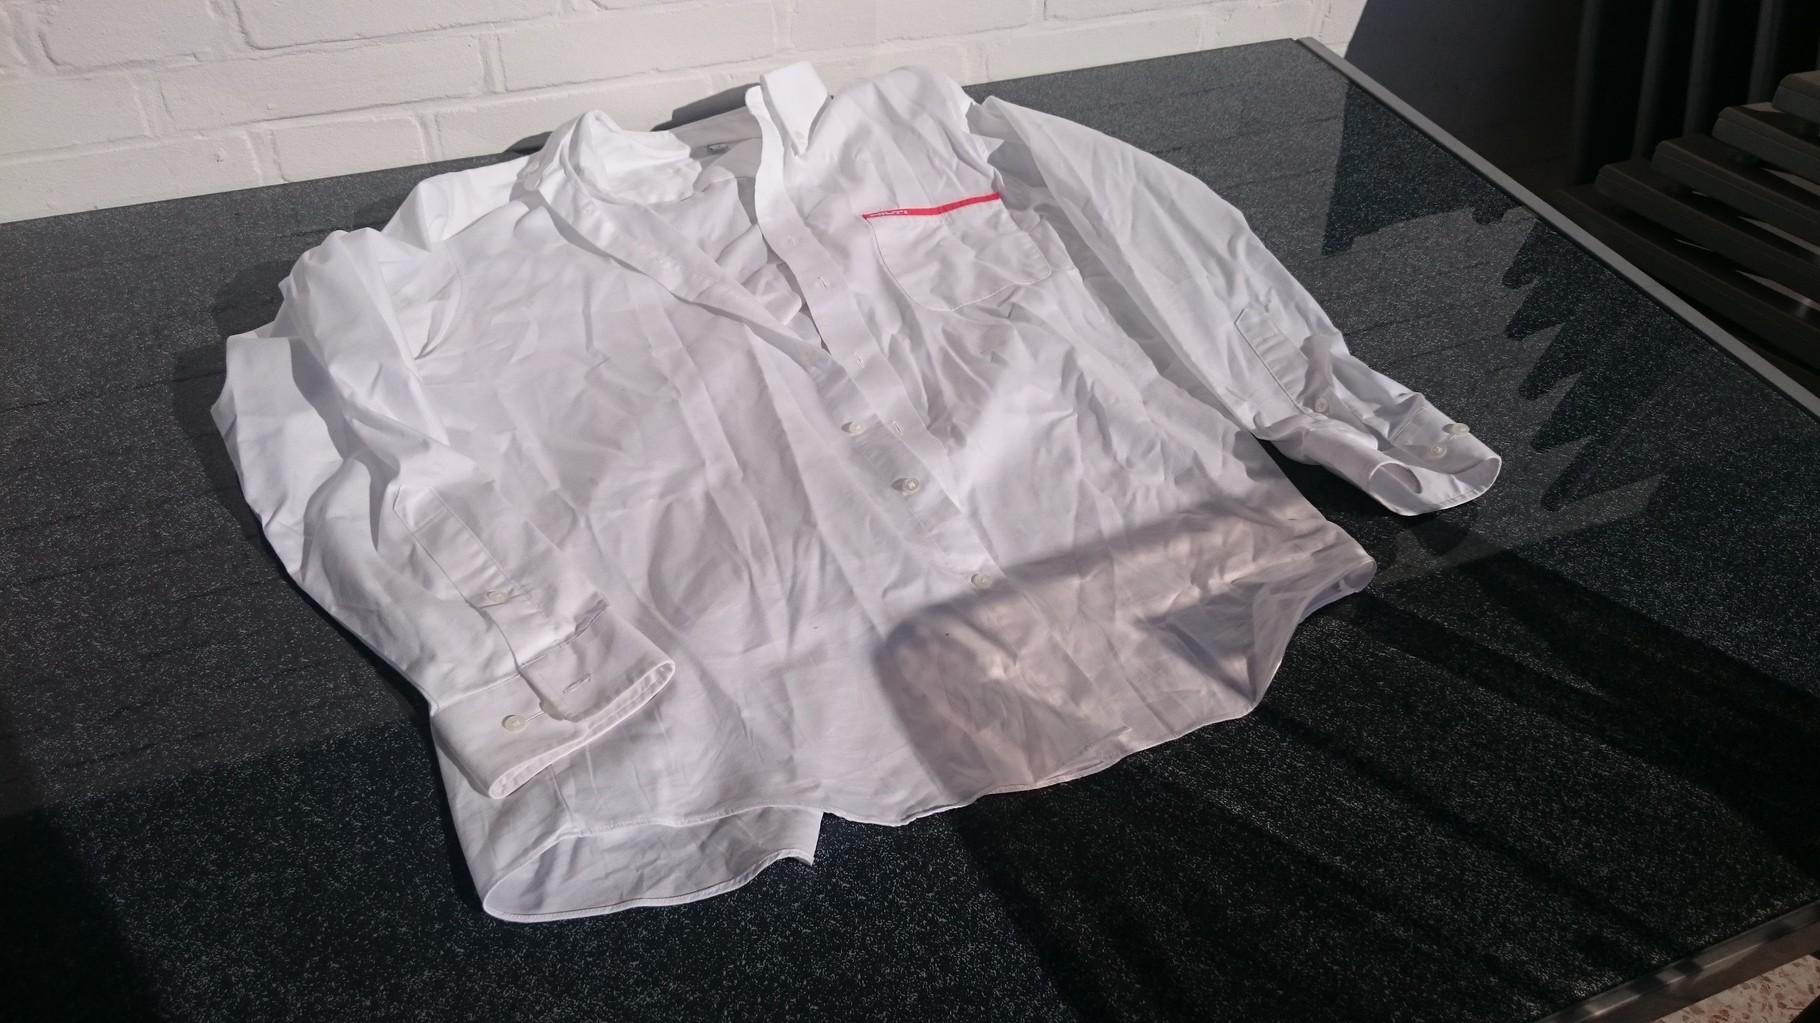 Herren-Oberhemd in weiß.